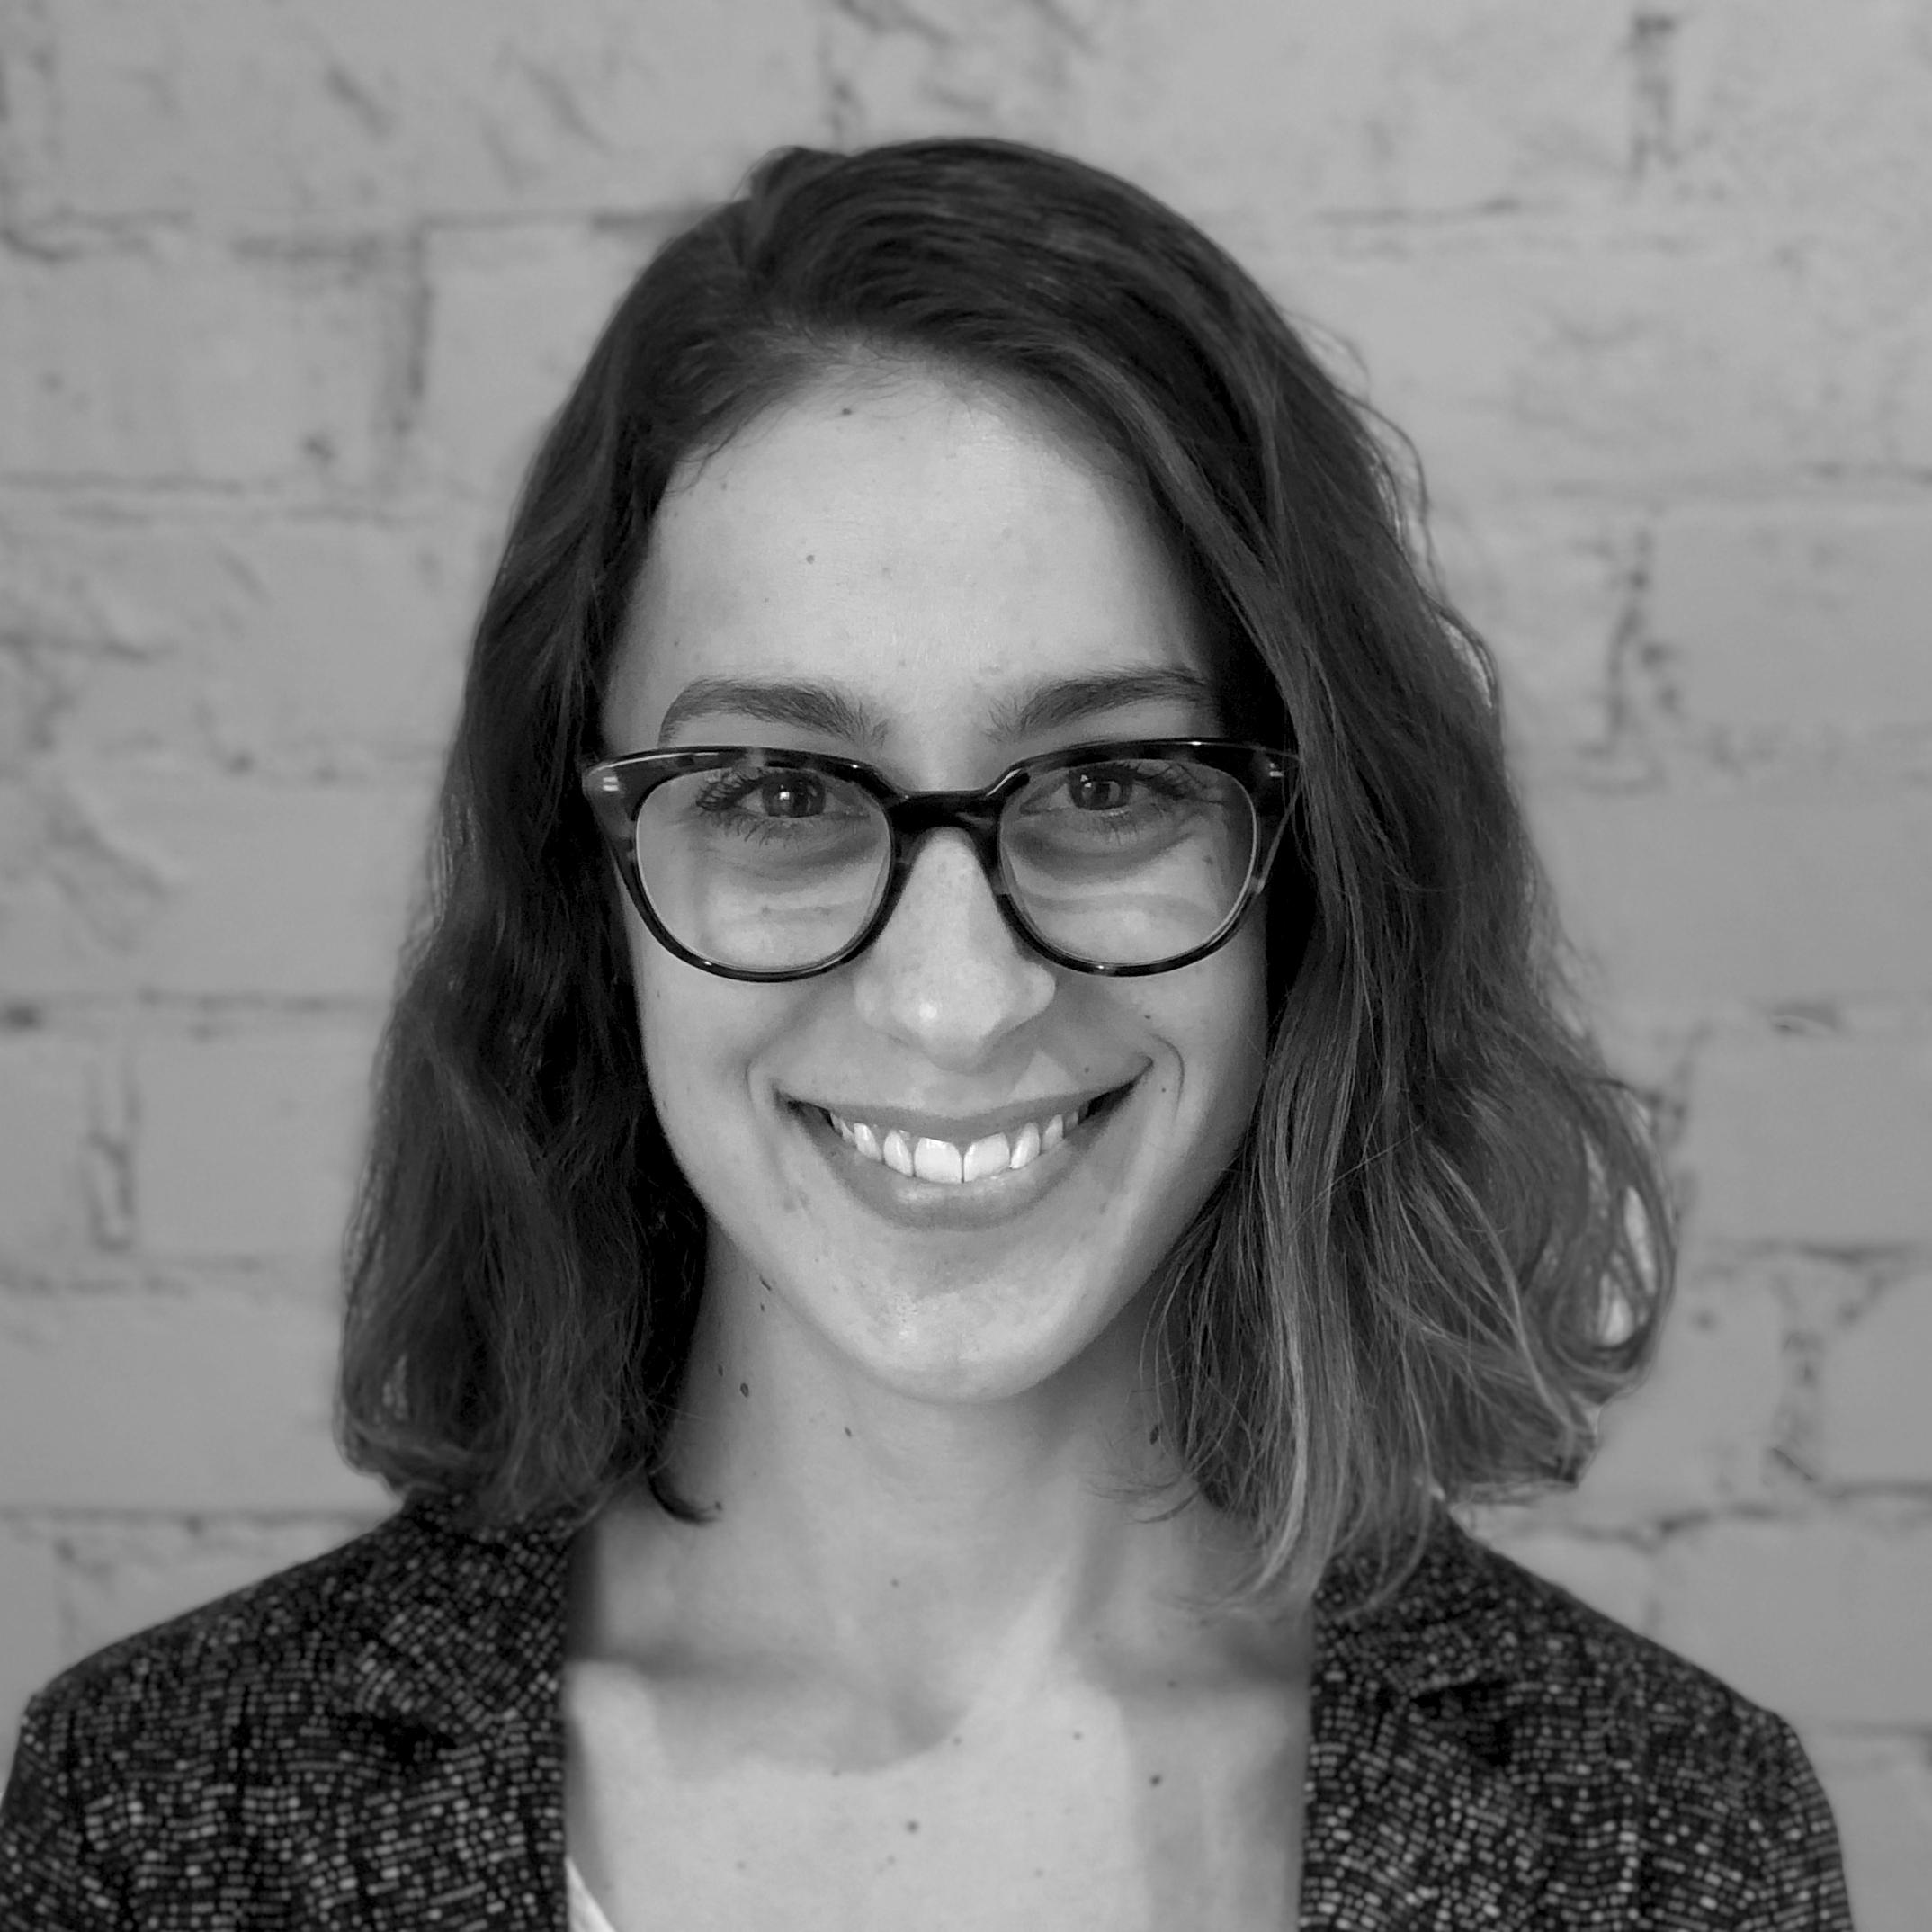 Kristin Schanbacher